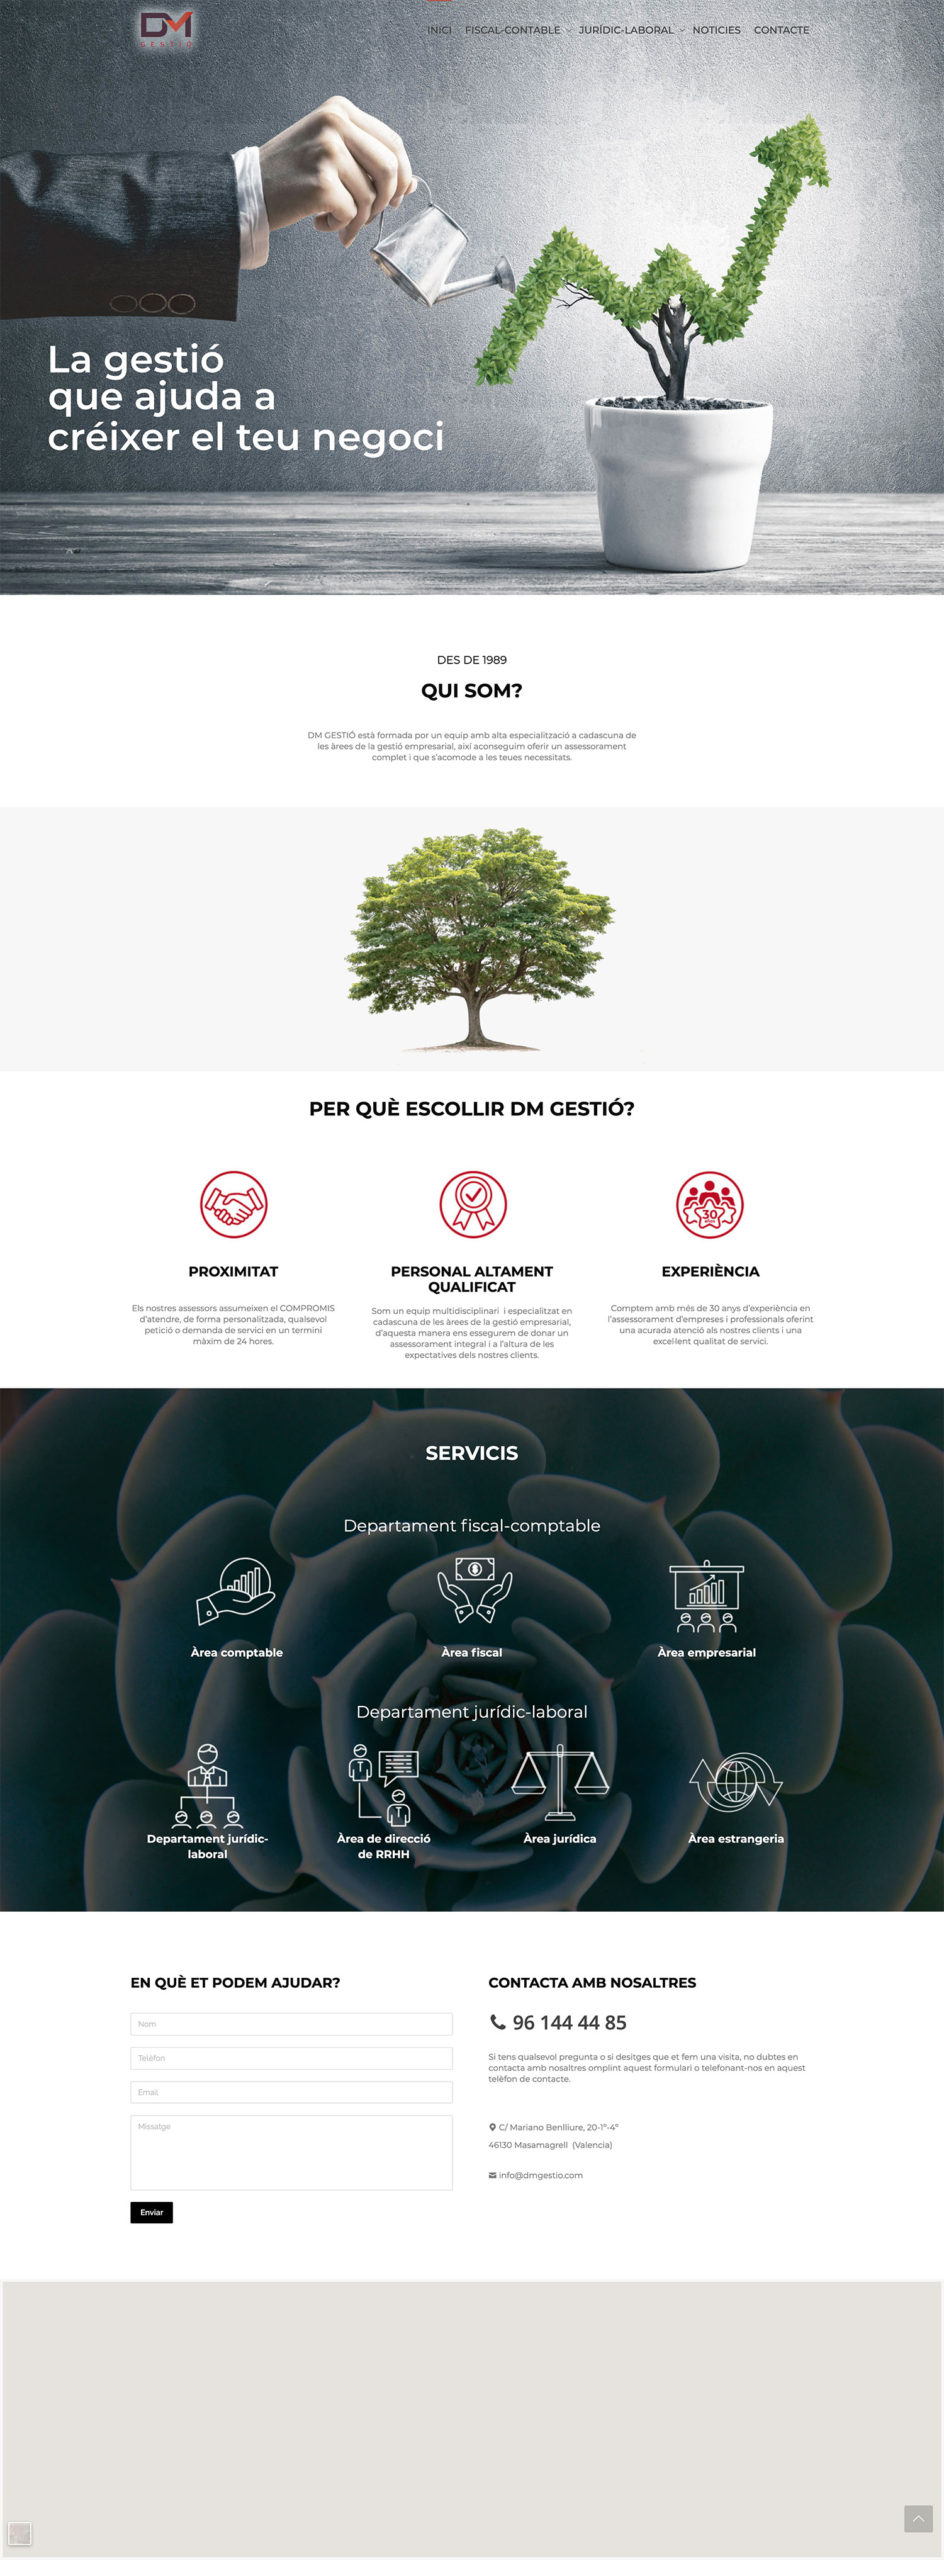 Diseño web Wellaggio | DM Gestó